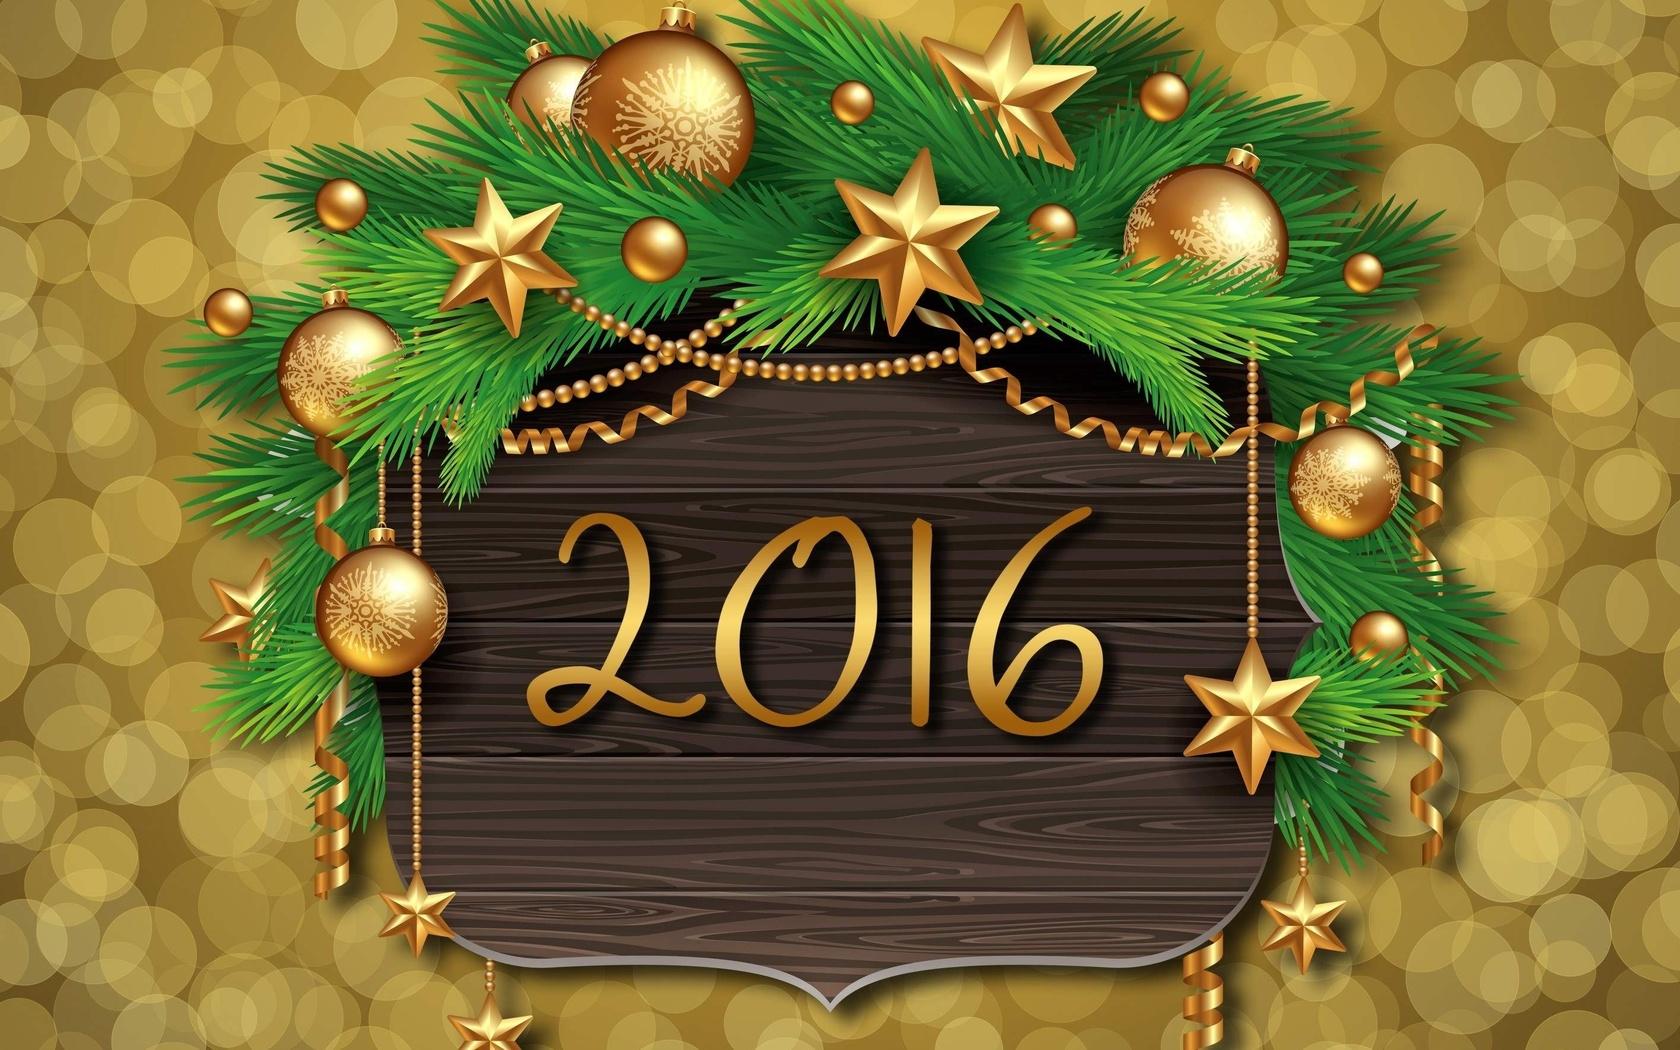 Поздравление на 2016 картинки